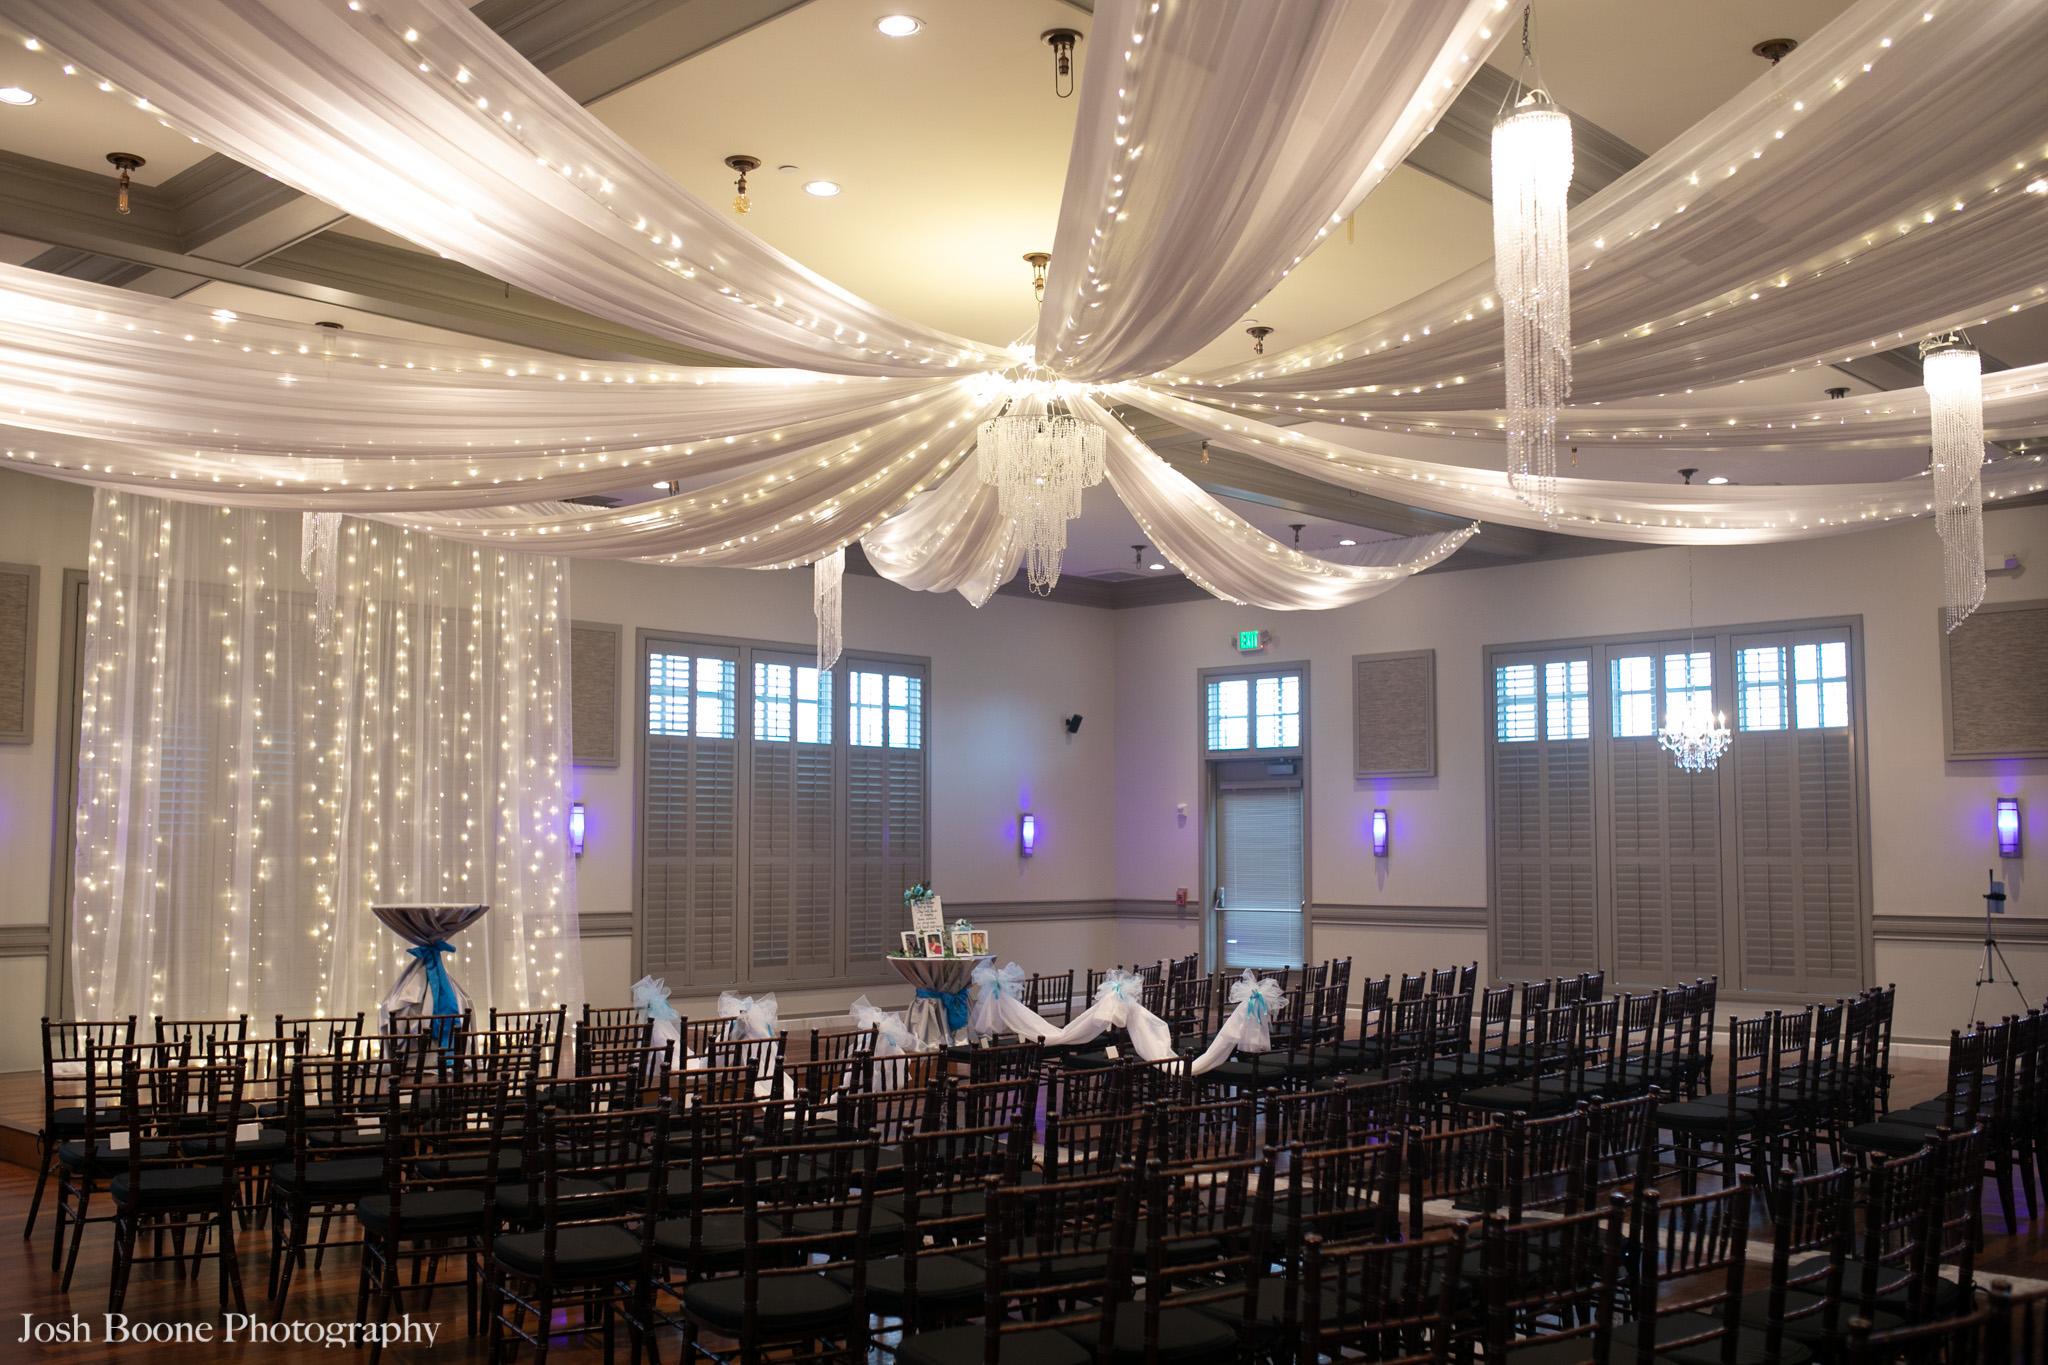 noahs_event_venue_wedding-29.jpg